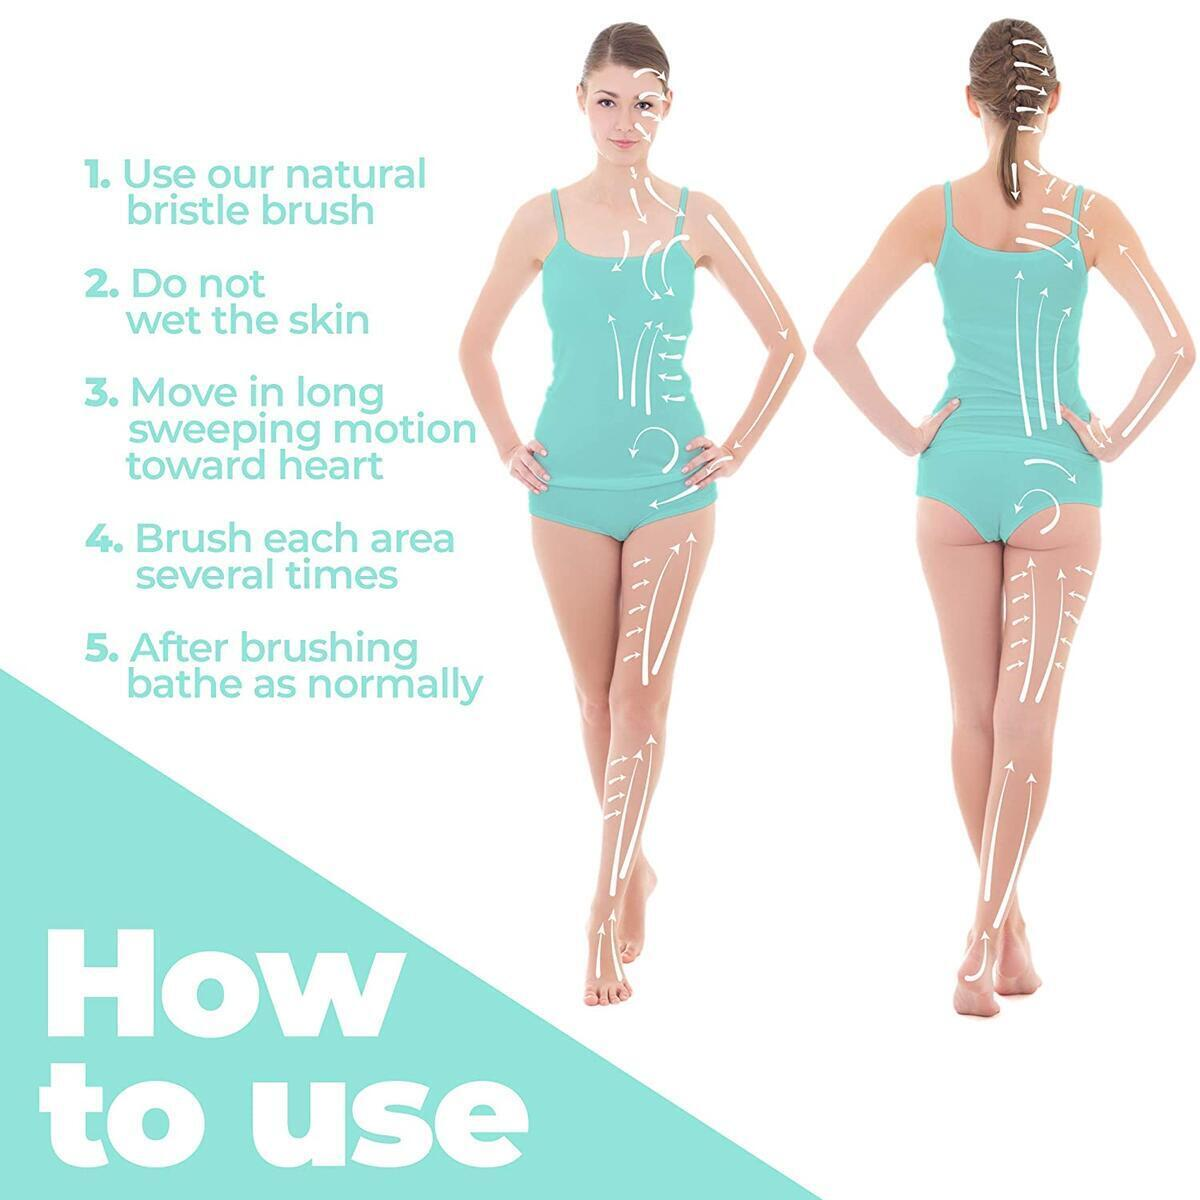 Dry Body Brush (100% Natural Bristle Brush), Reduce Cellulite - Dry Brush for Cellulite and Lymphatic Drainage, Exfoliating Brush With Soft Massage Nodules - Shower Brush Body Scrubber Skin Brush